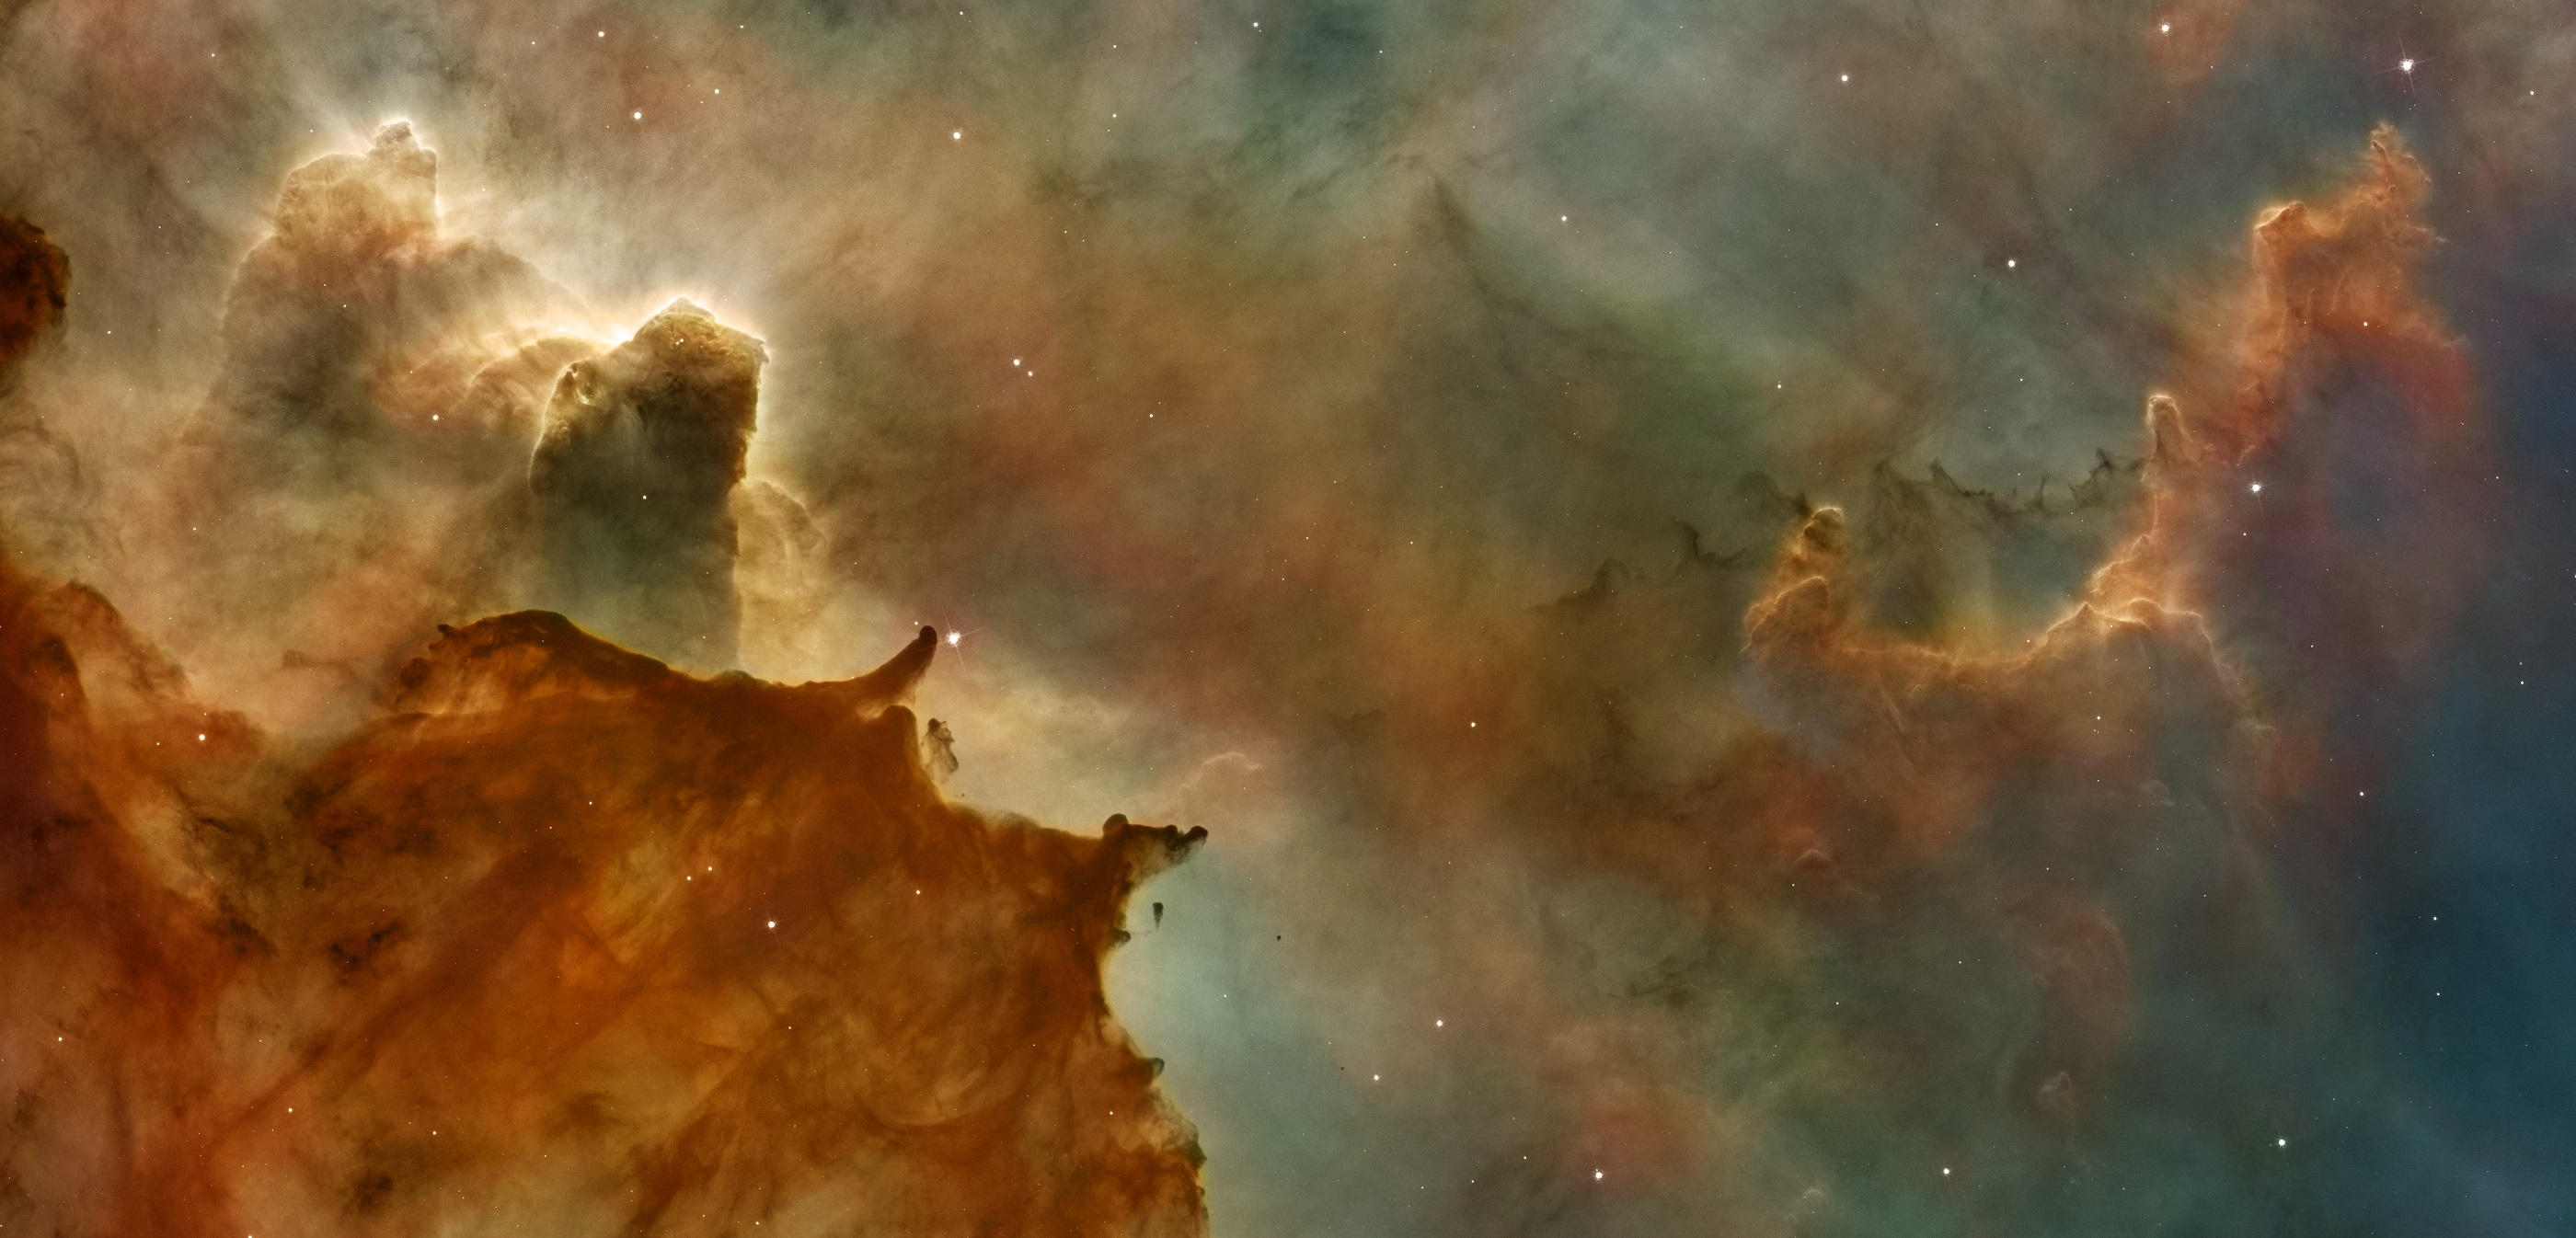 Nebula Carina Nebula Space Sci Fi 2800x1346